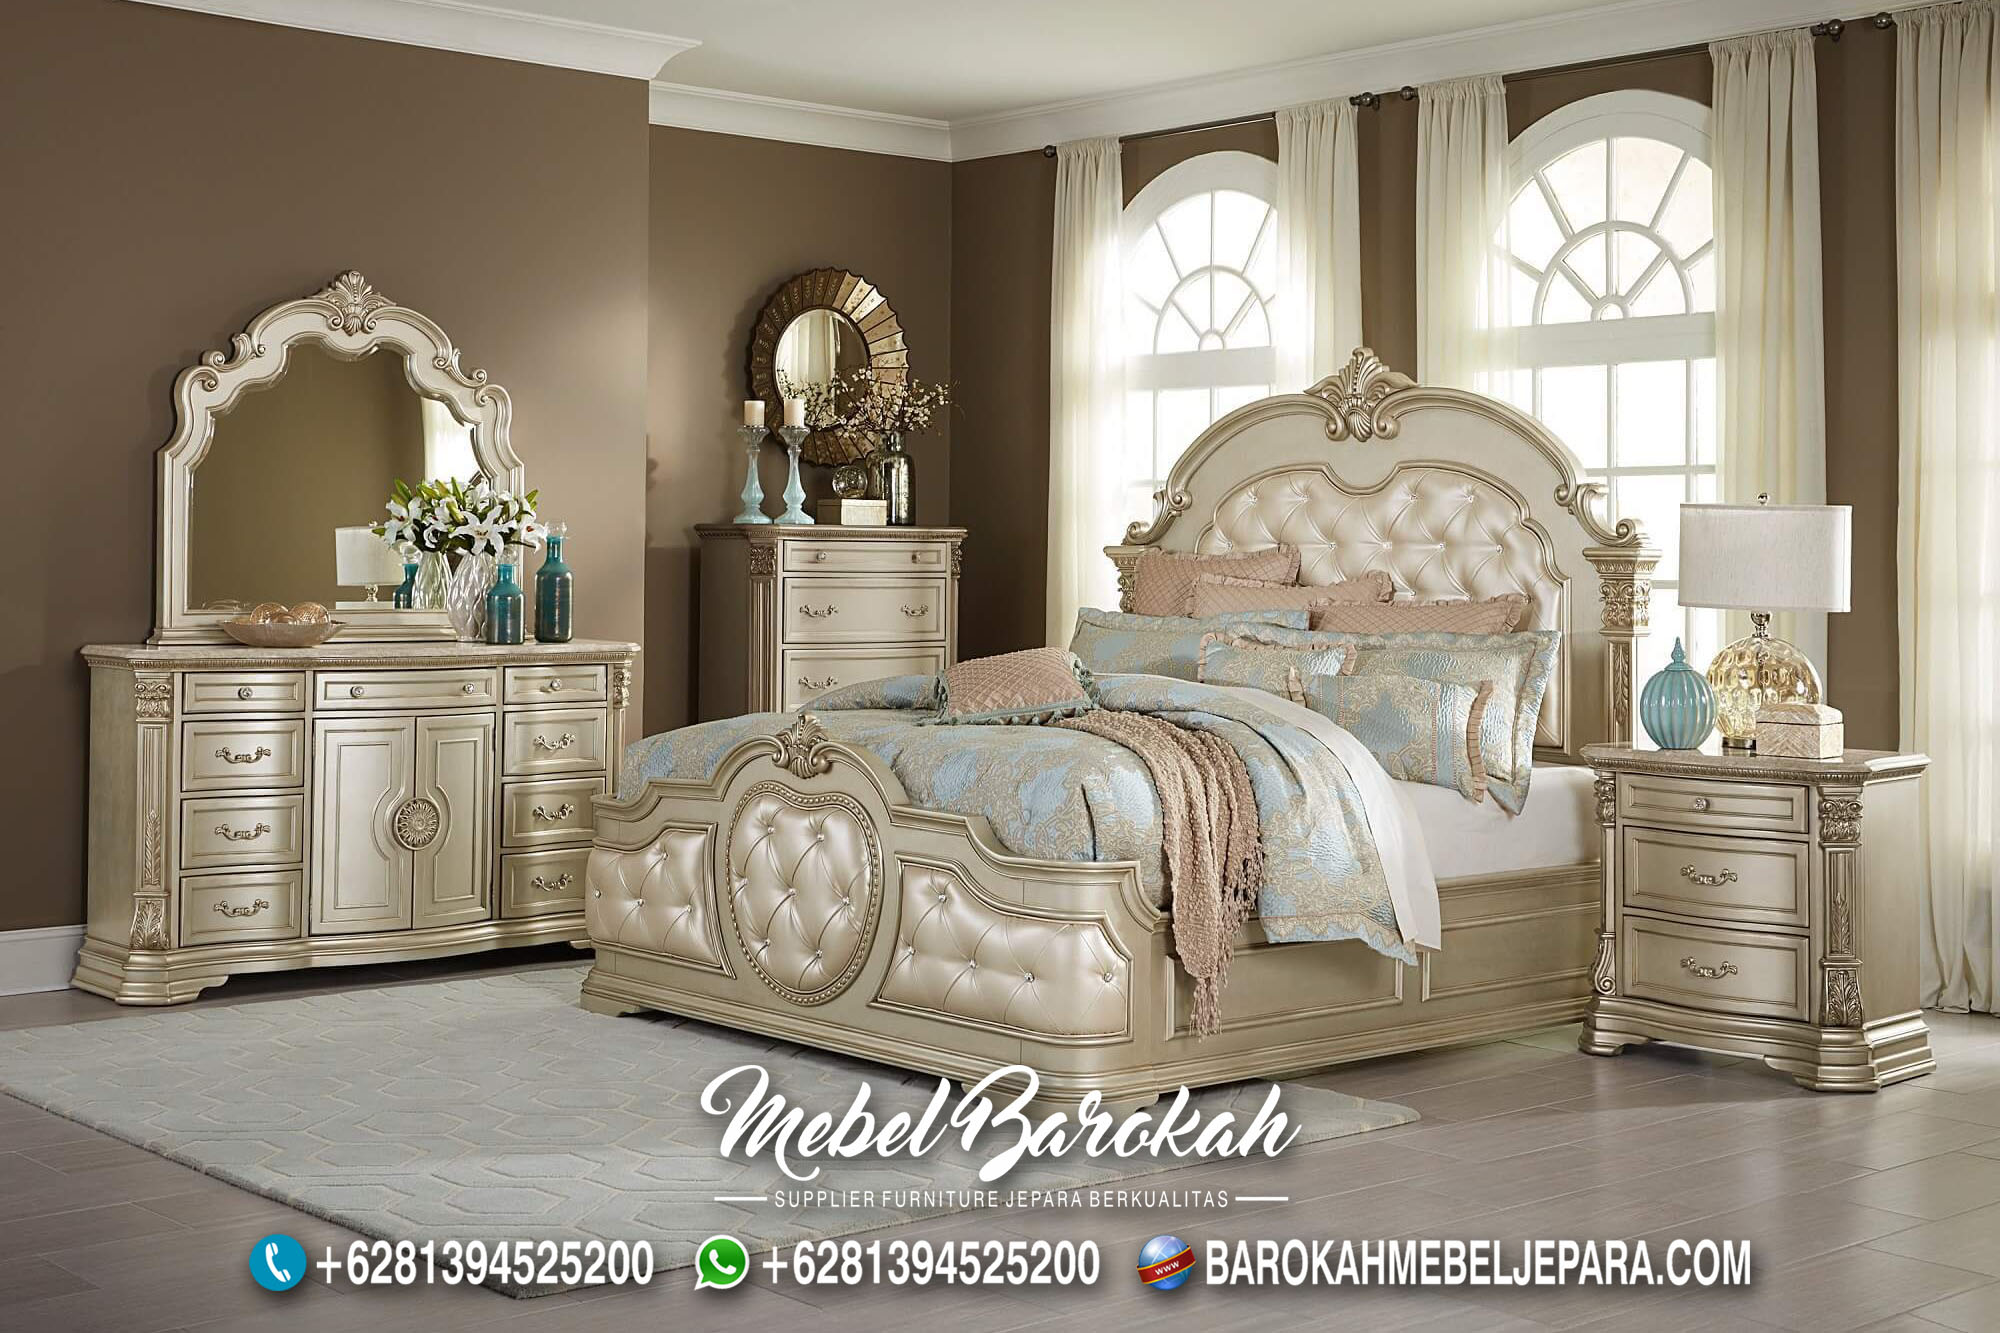 Set Tempat Tidur Mewah Classy Versace MB-665